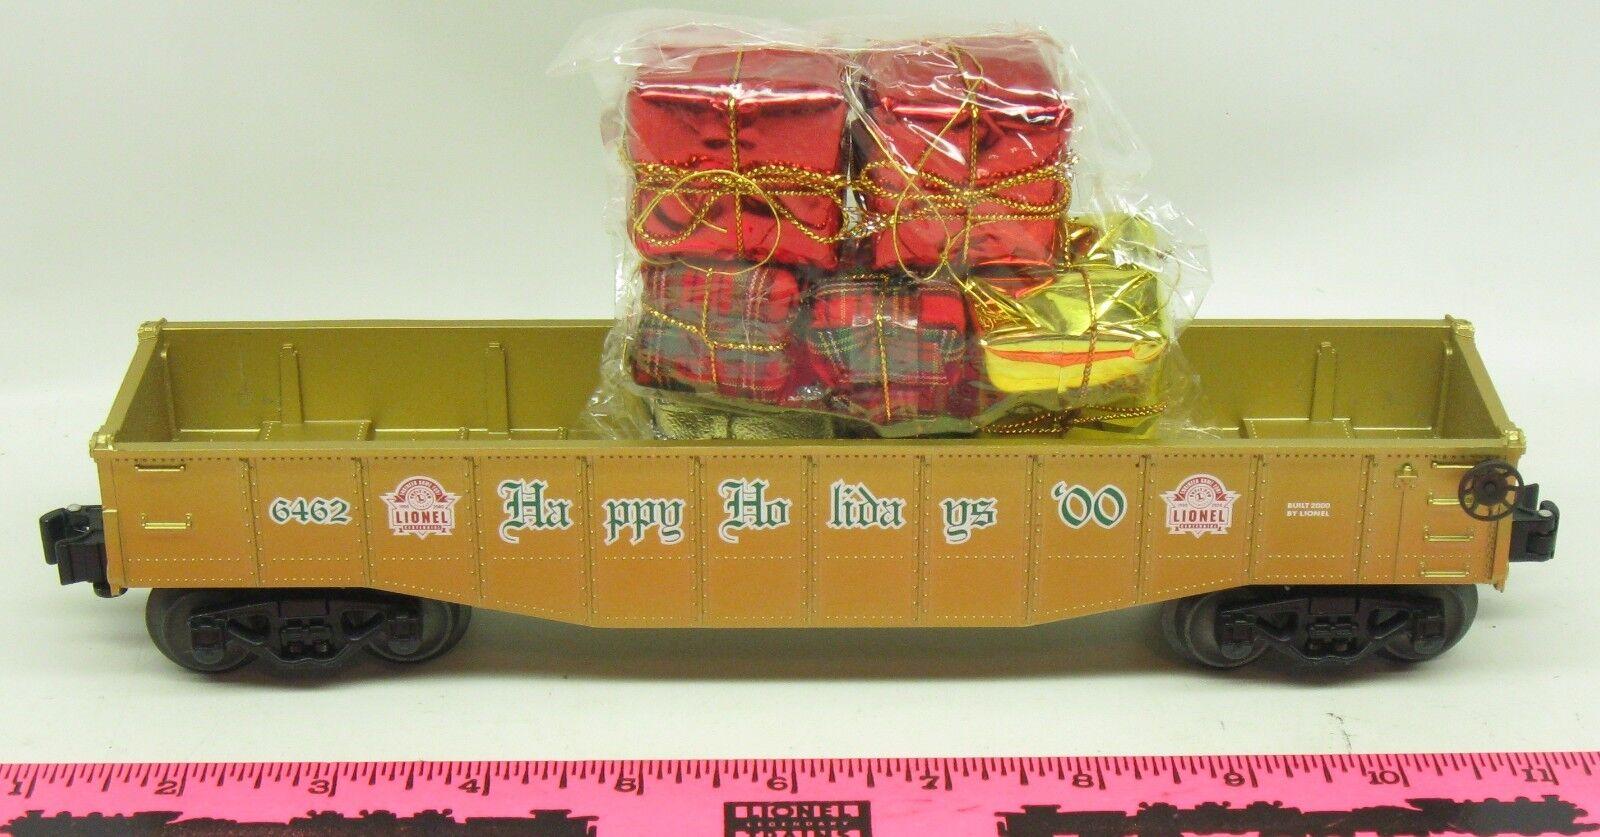 Lionel  6462 Happy Holidays 2000 Gondola with presents